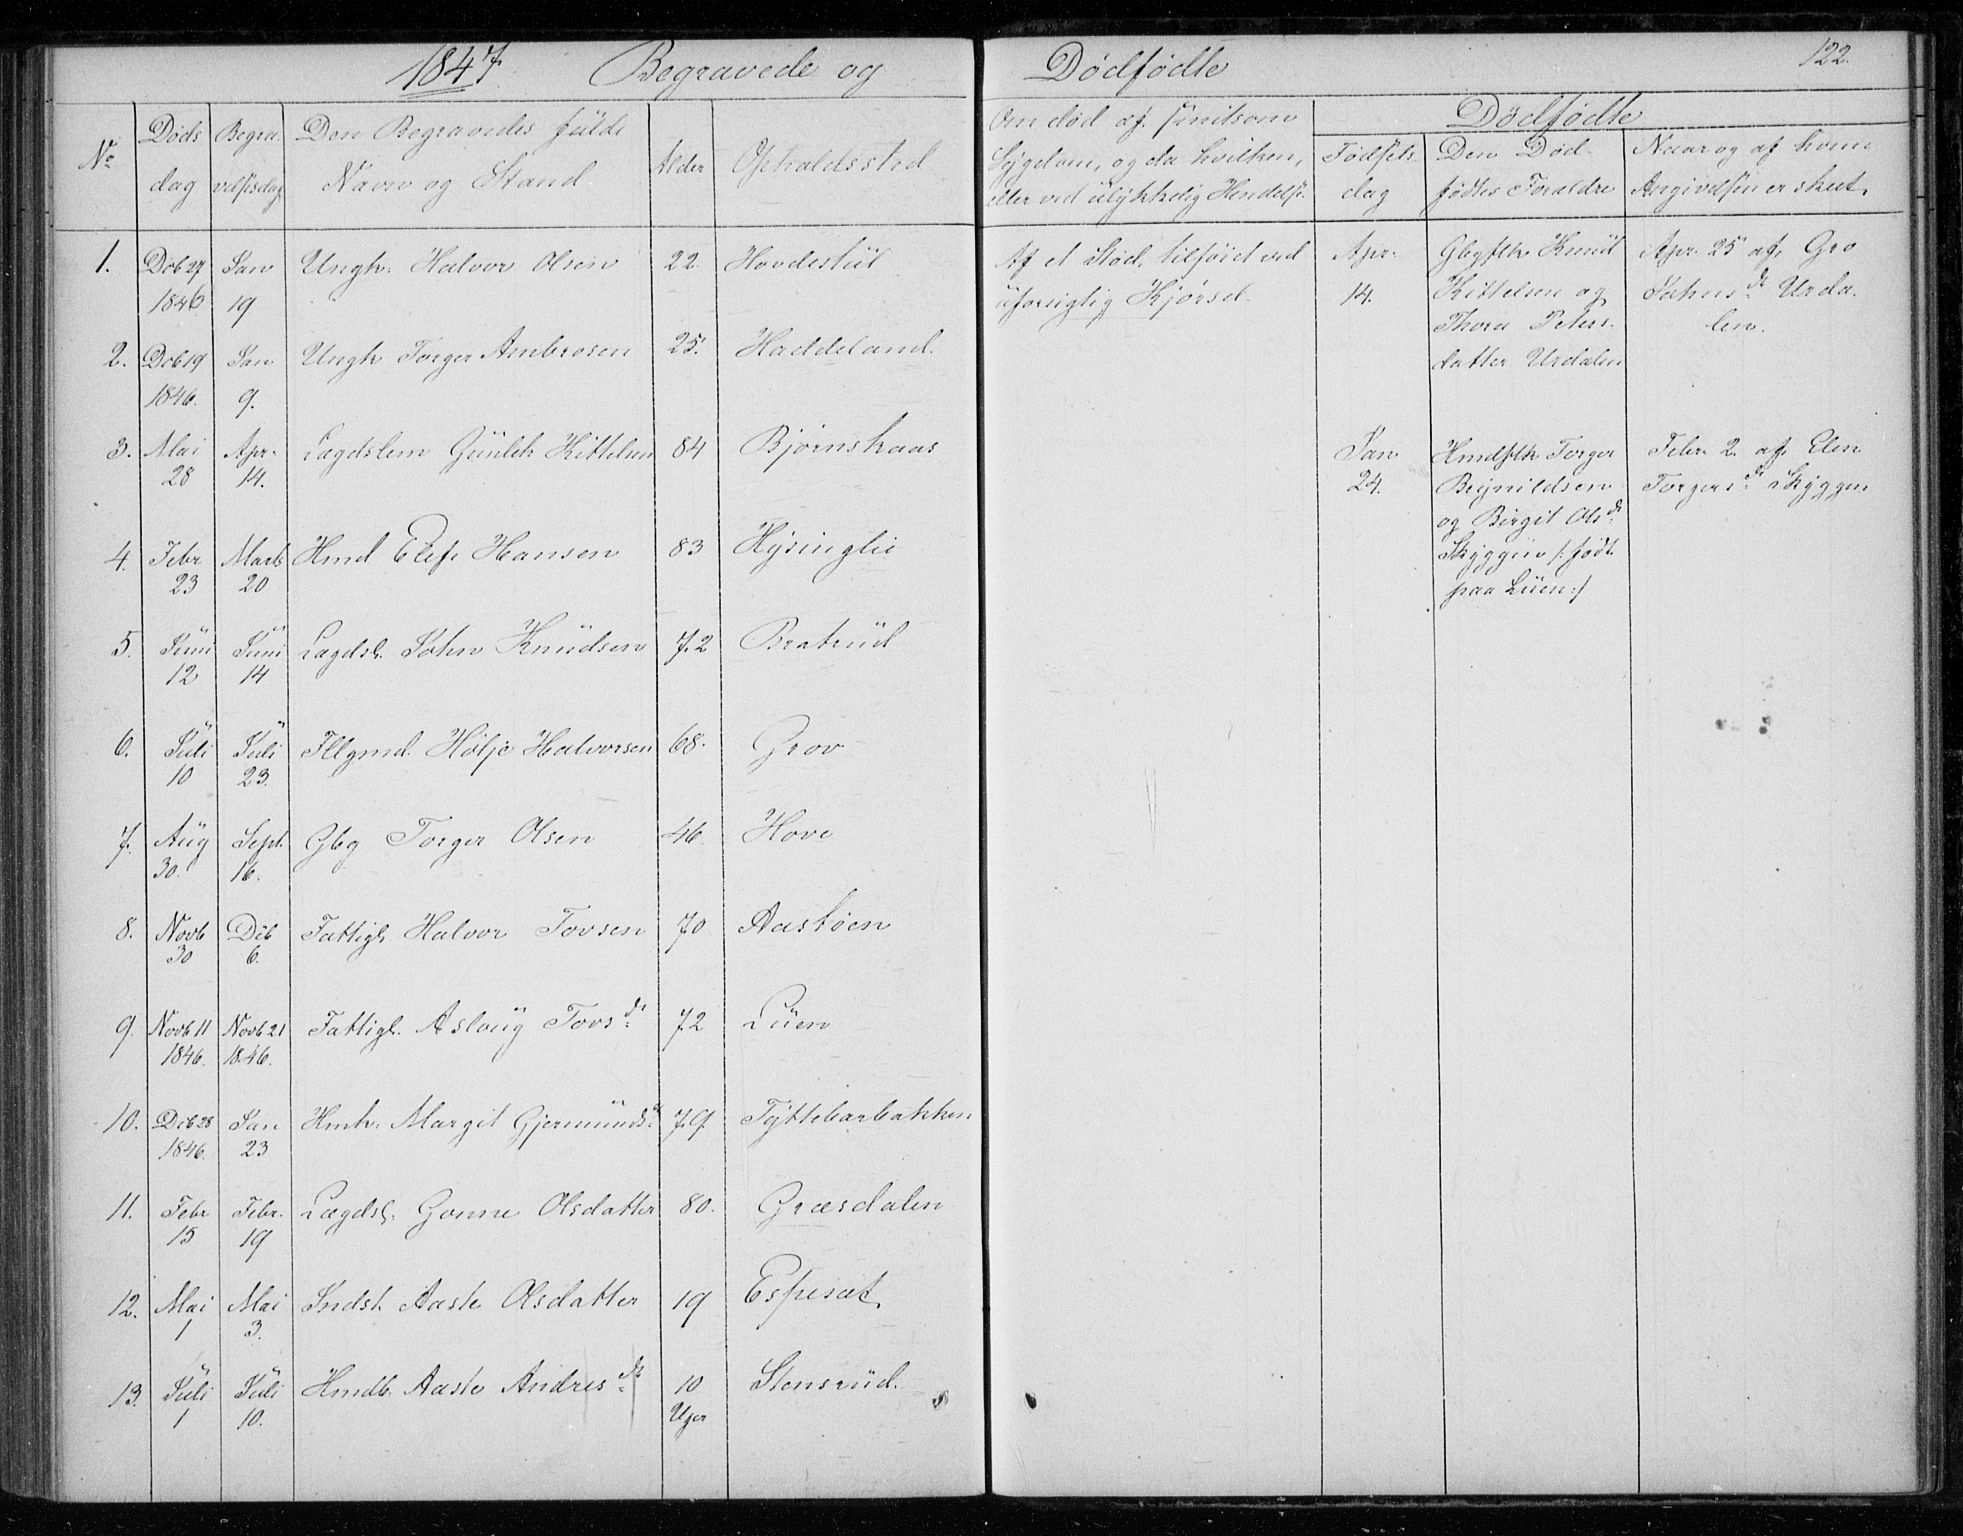 SAKO, Gransherad kirkebøker, F/Fb/L0003: Ministerialbok nr. II 3, 1844-1859, s. 122